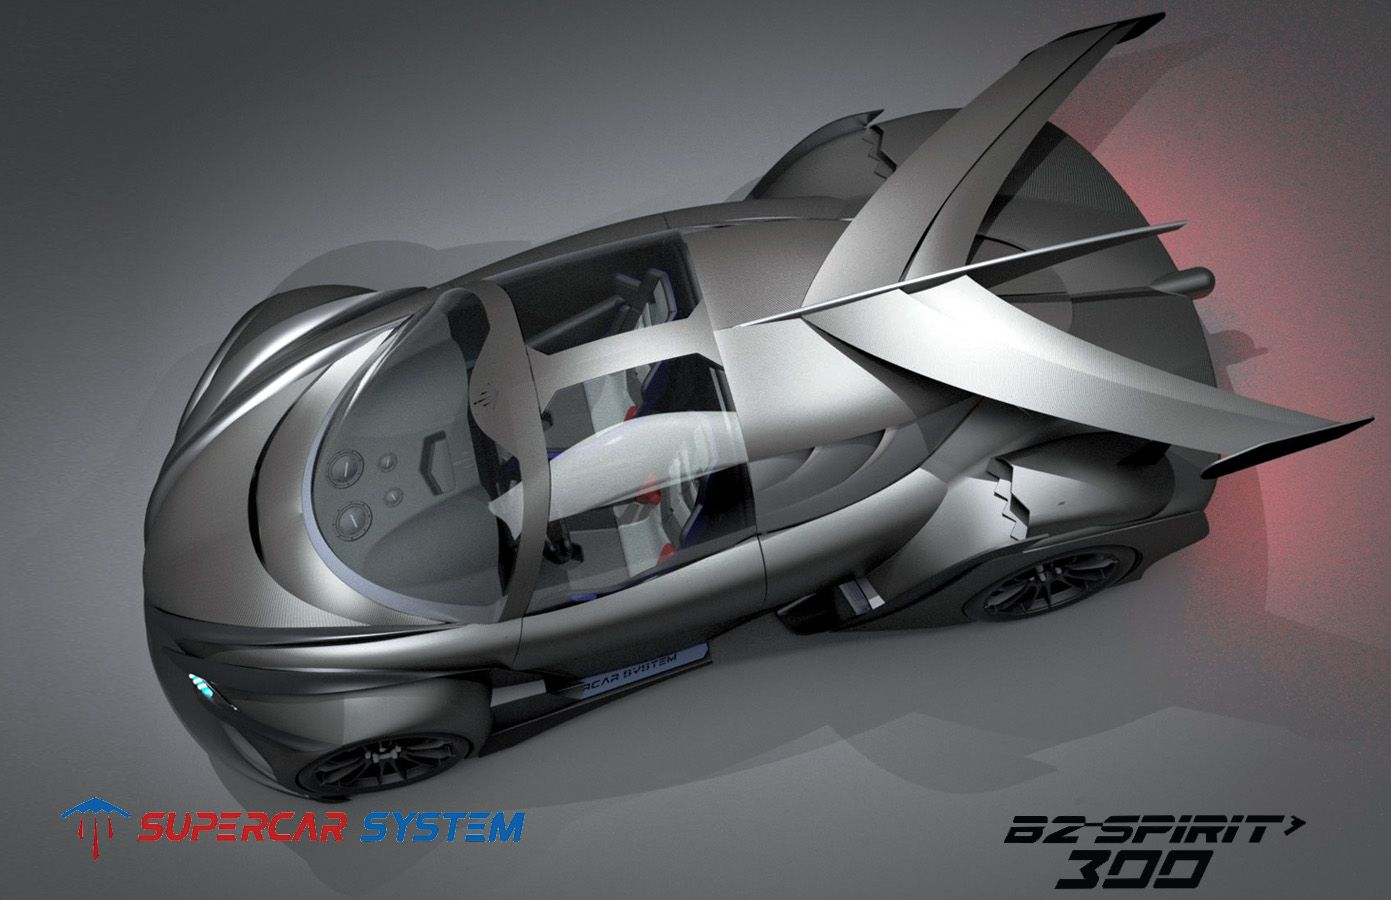 300 B 10 Super Cars System Body